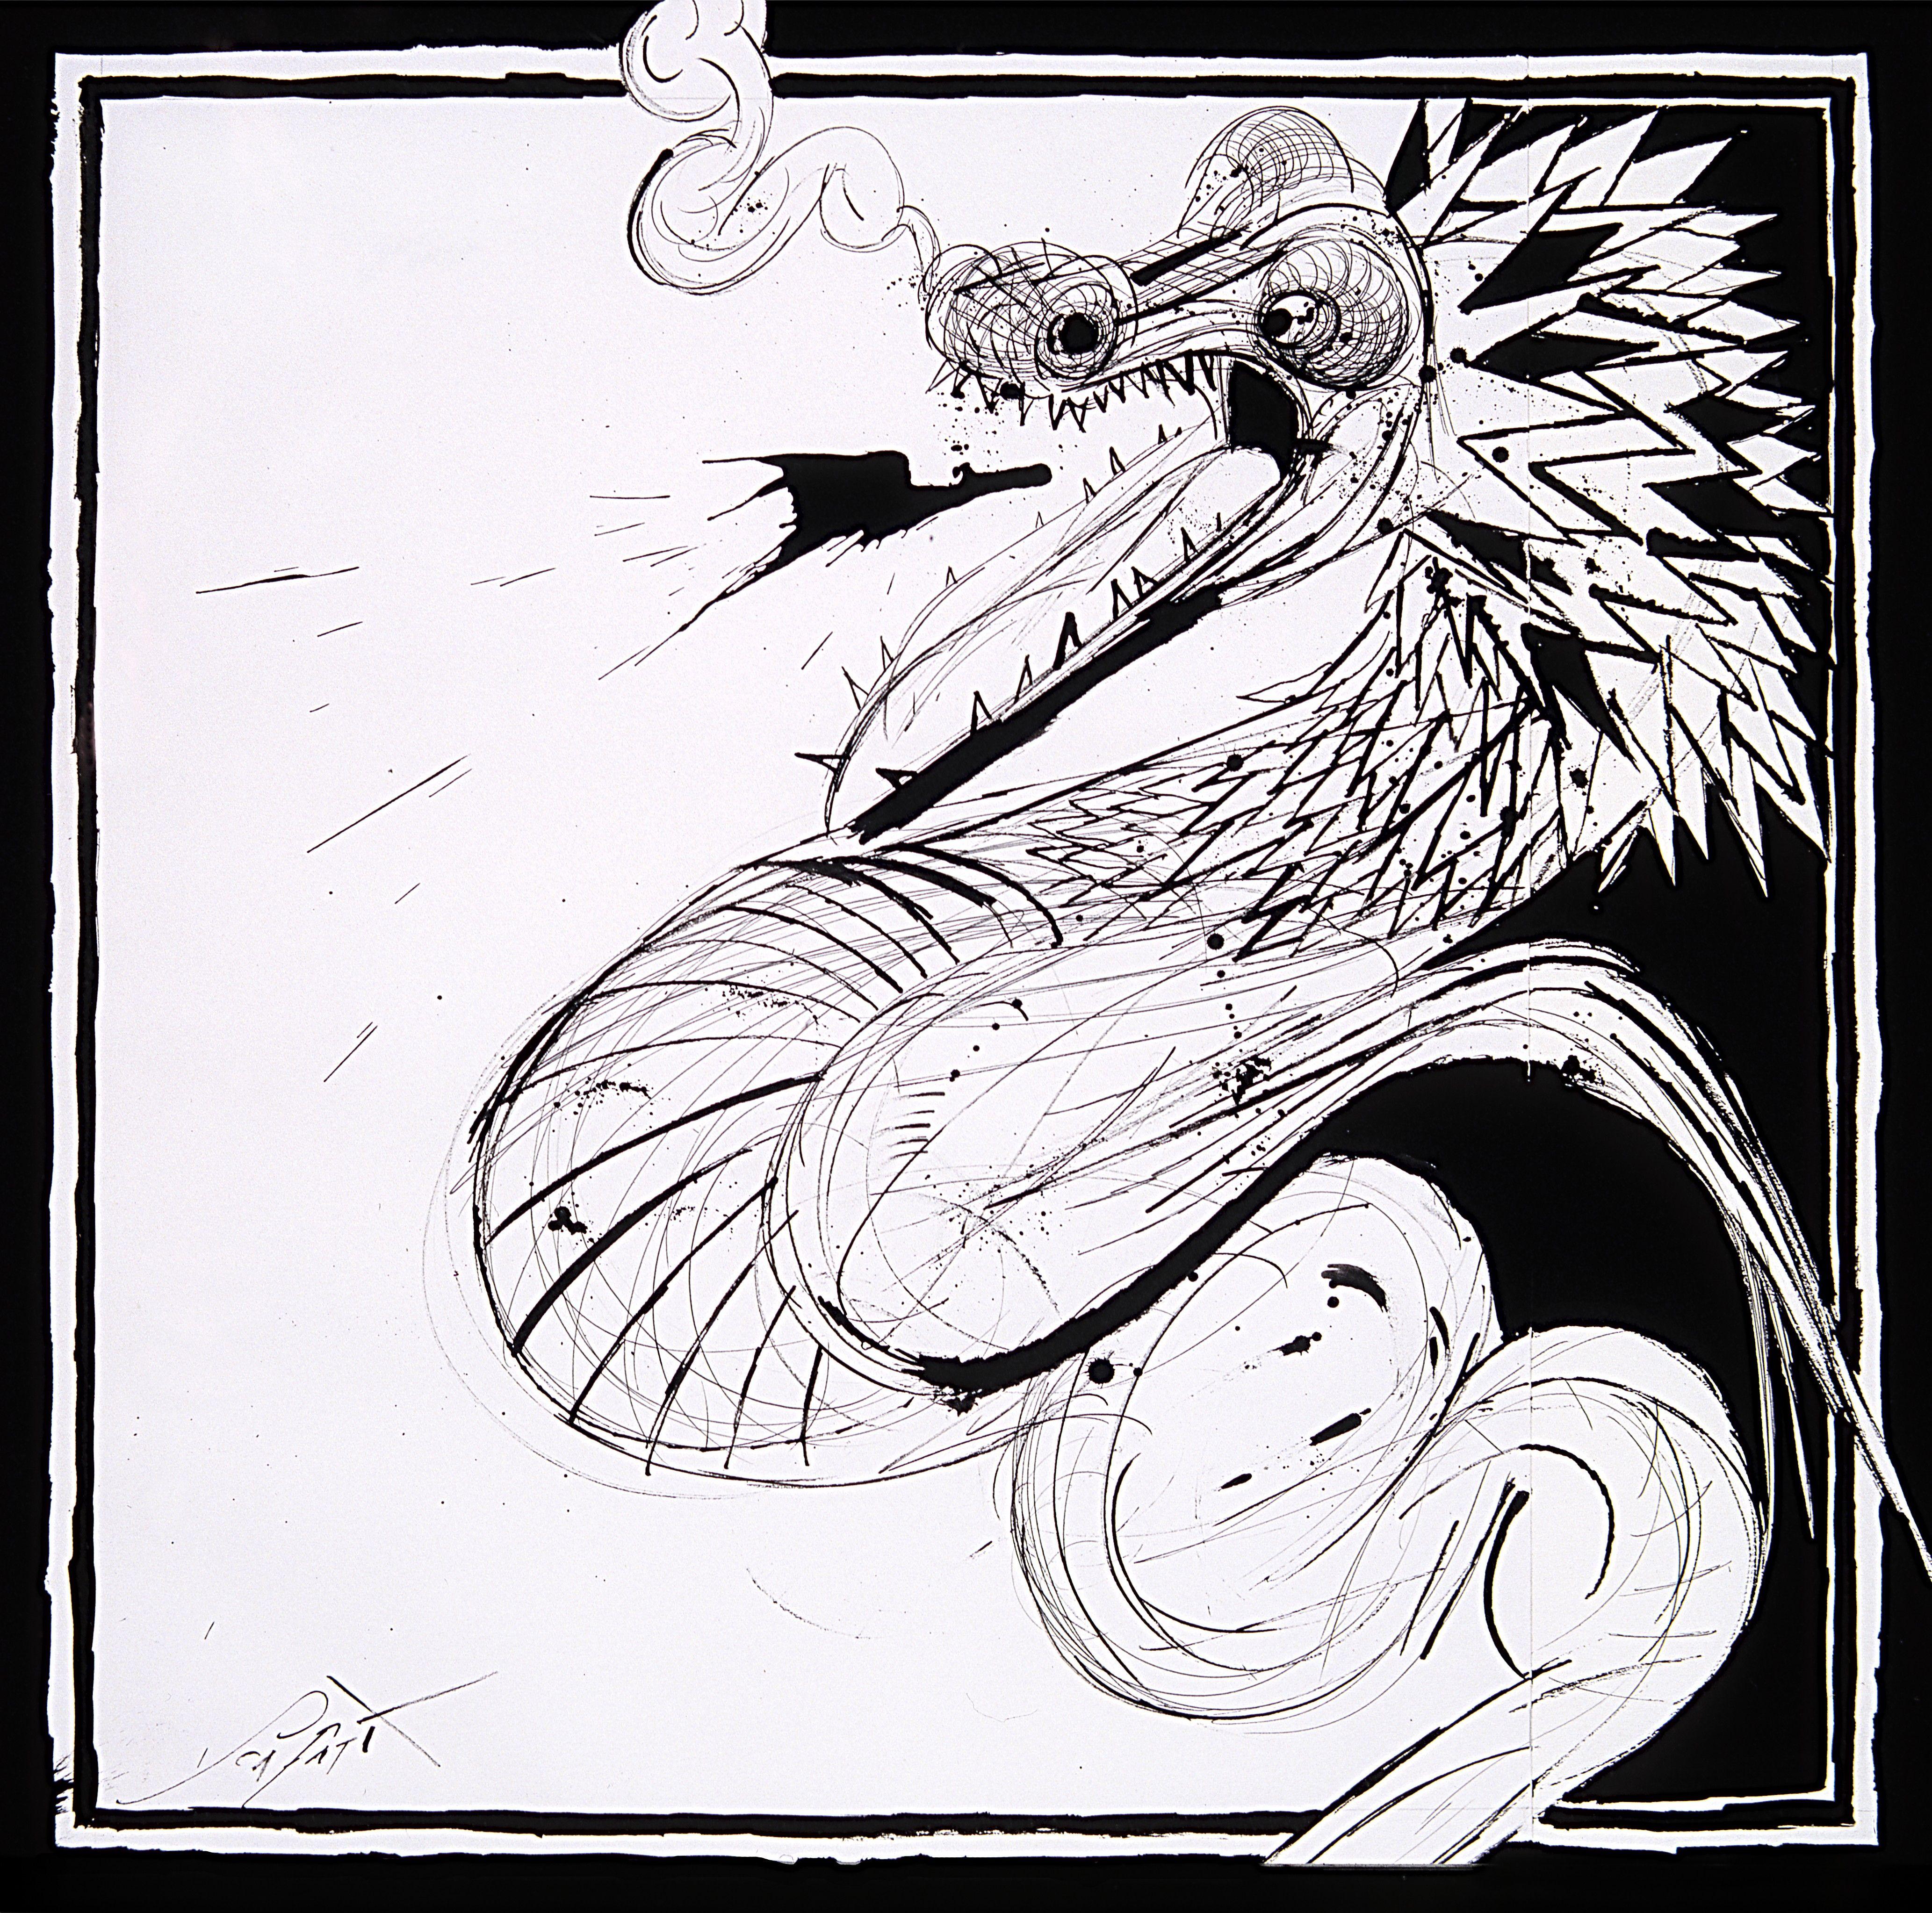 Scafatti, Luis: Munchi Pupunchi - Dibujo, tinta sobre papel (30 x 30 cm)